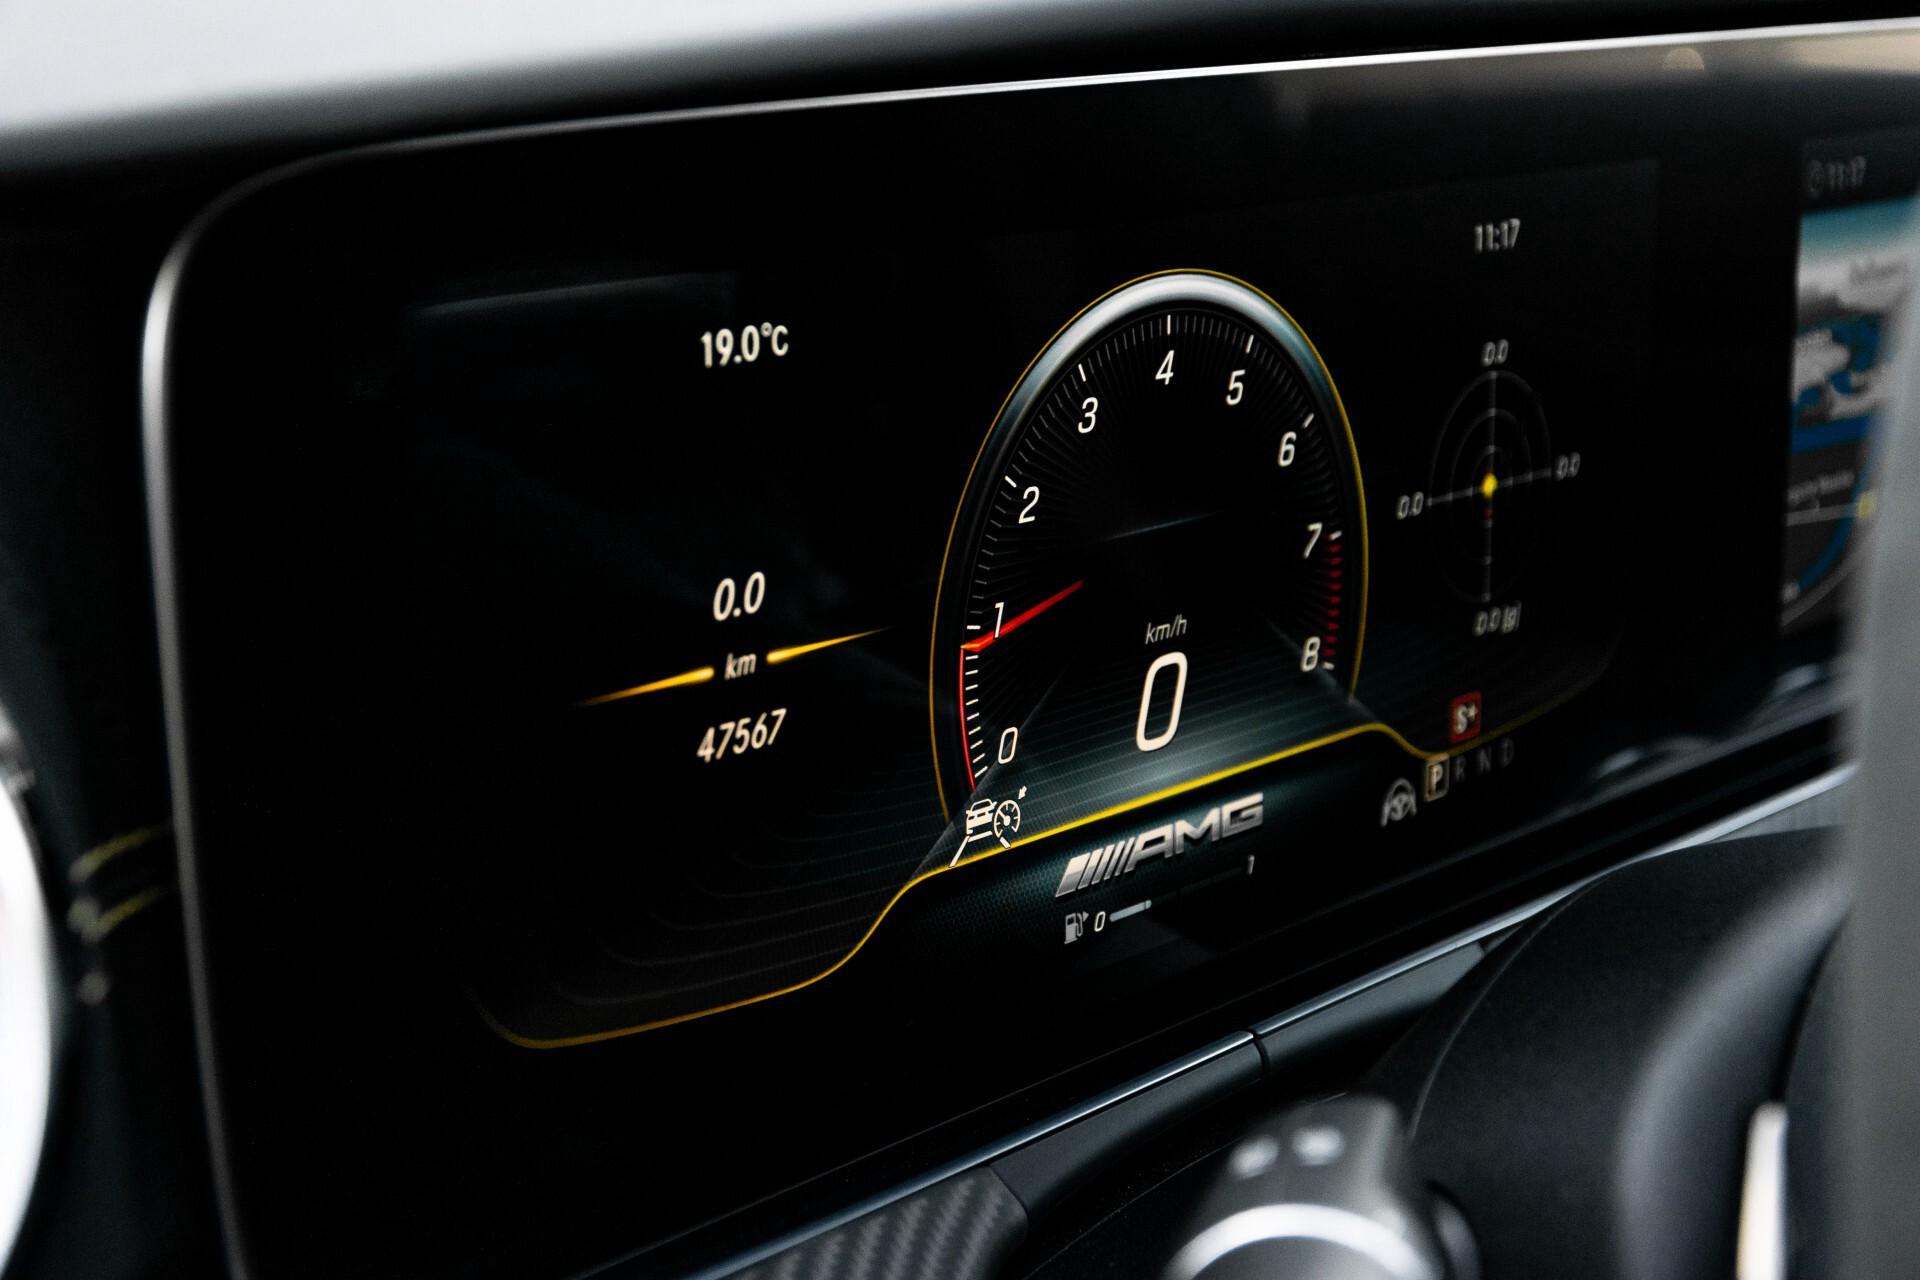 Mercedes-Benz AMG GT 4-Door Coupe 63 S 4MATIC+ Edition 1 Keramisch/Carbon/First Class/Dynamic Plus/Burmester High End 3D Aut9 Foto 42